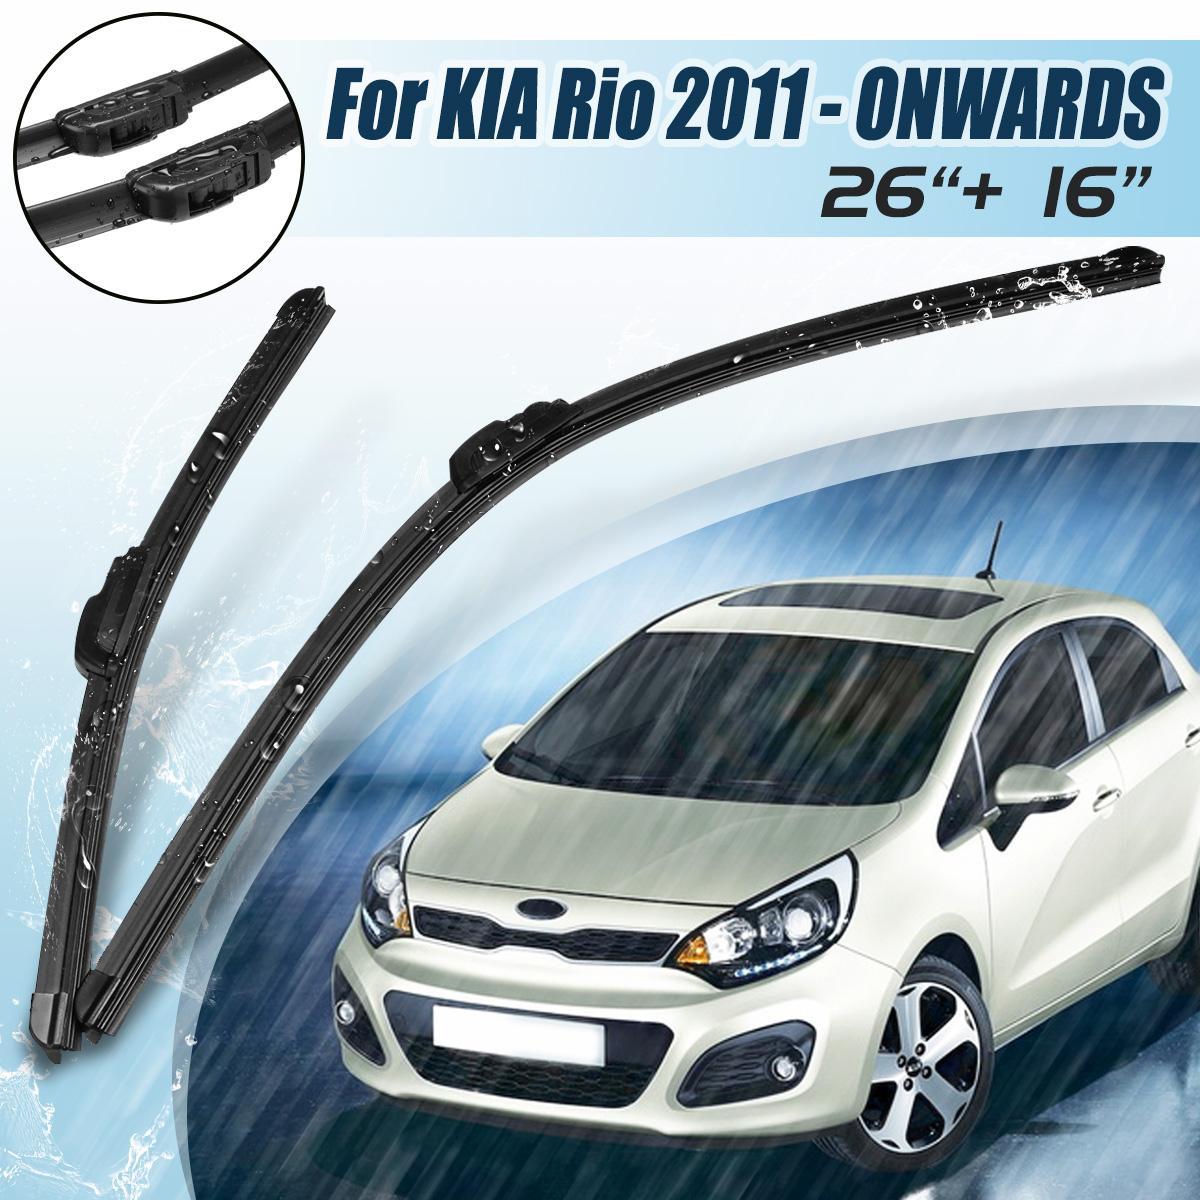 For Motors Kia Rio 2011 Onwards Brand New Front Windscreen Wiper Blades 26 16 Buy Sell Online Best Prices In Srilanka Daraz Lk